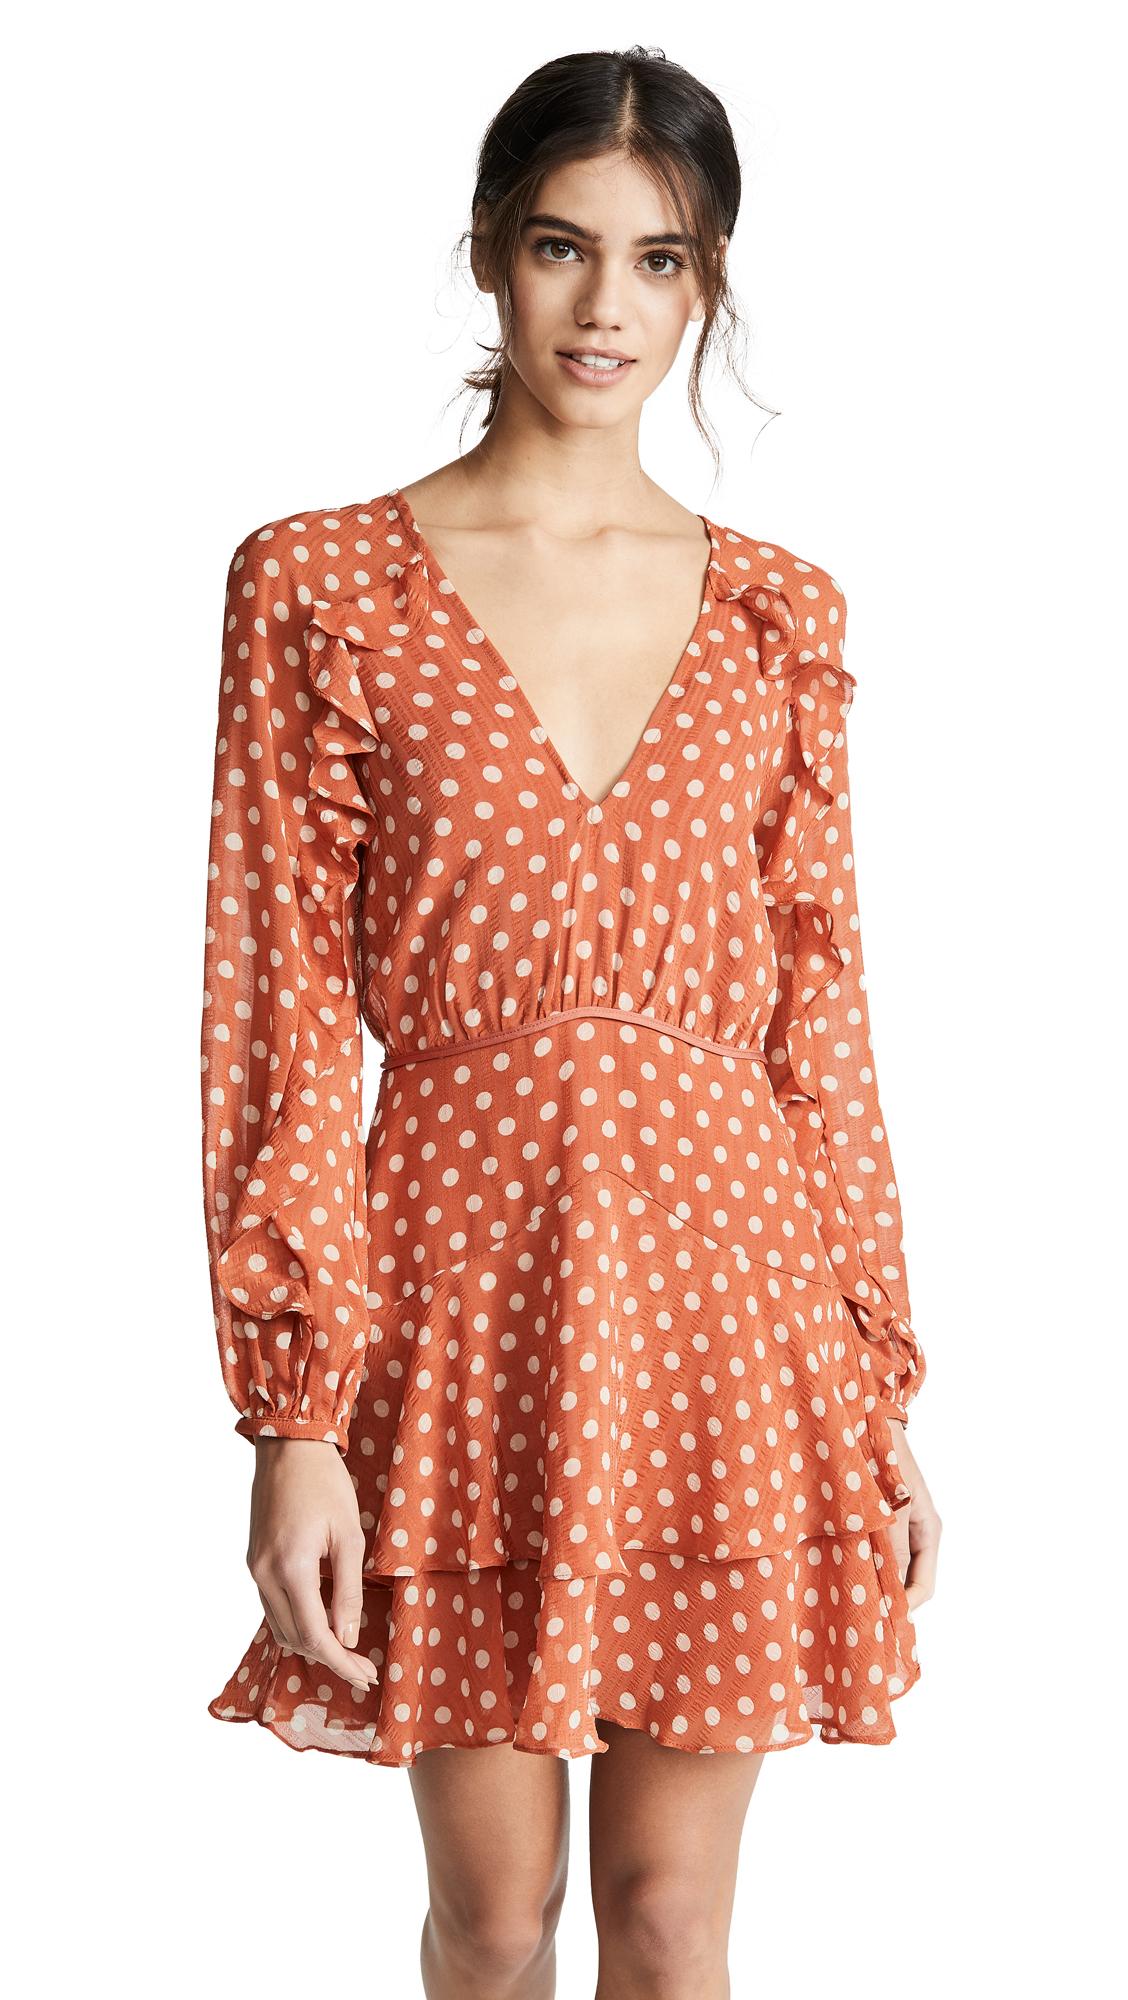 La Maison Talulah Love Token Polka-Dot Ruffle Short Dress in Salmon Spot